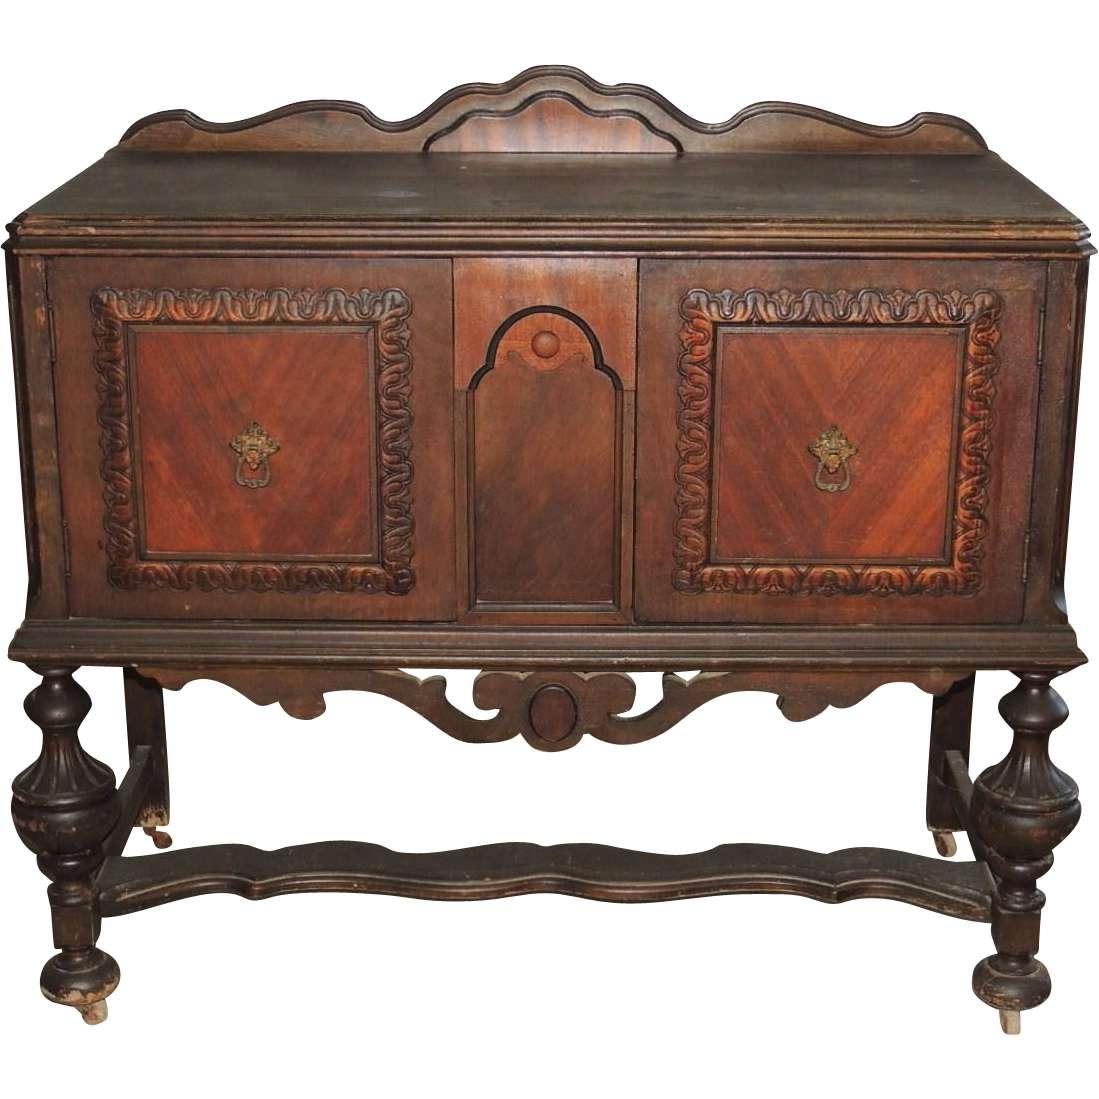 Jacobean Renaissance Revival Walnut Sideboard Buffet Server From Regarding Jacobean Sideboards Buffets (Gallery 1 of 20)